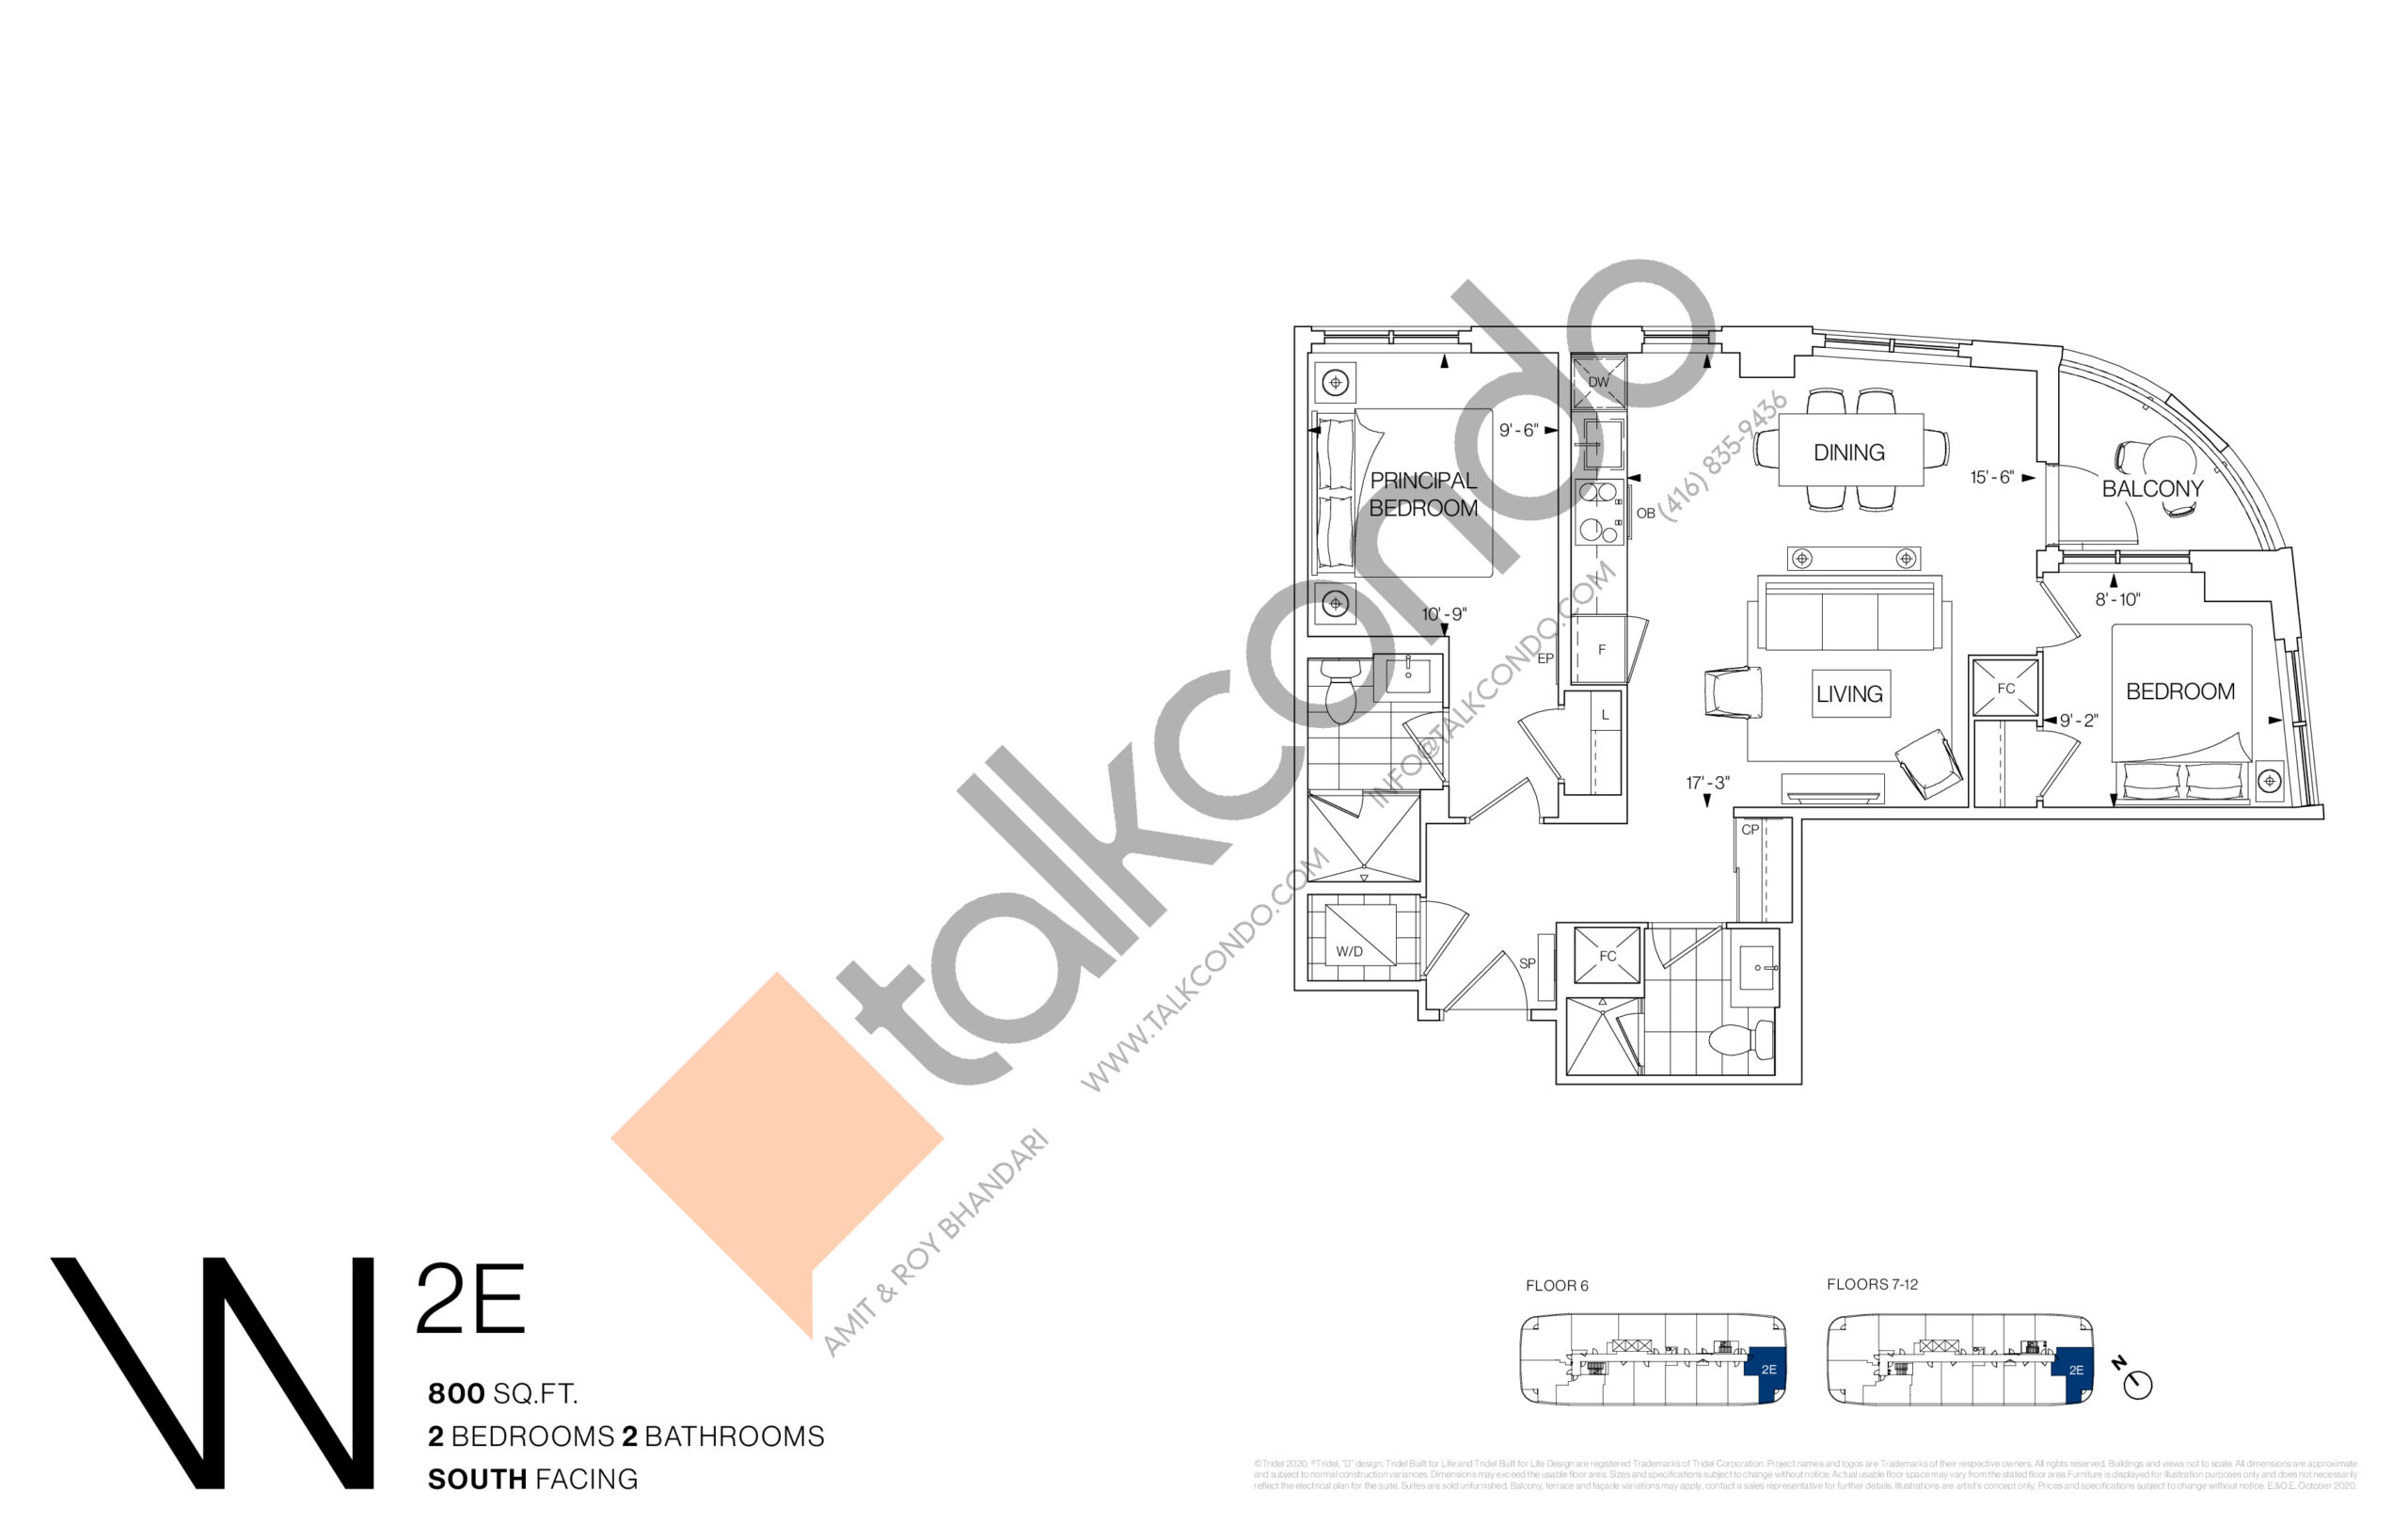 2E Floor Plan at Westerly Condos - 800 sq.ft